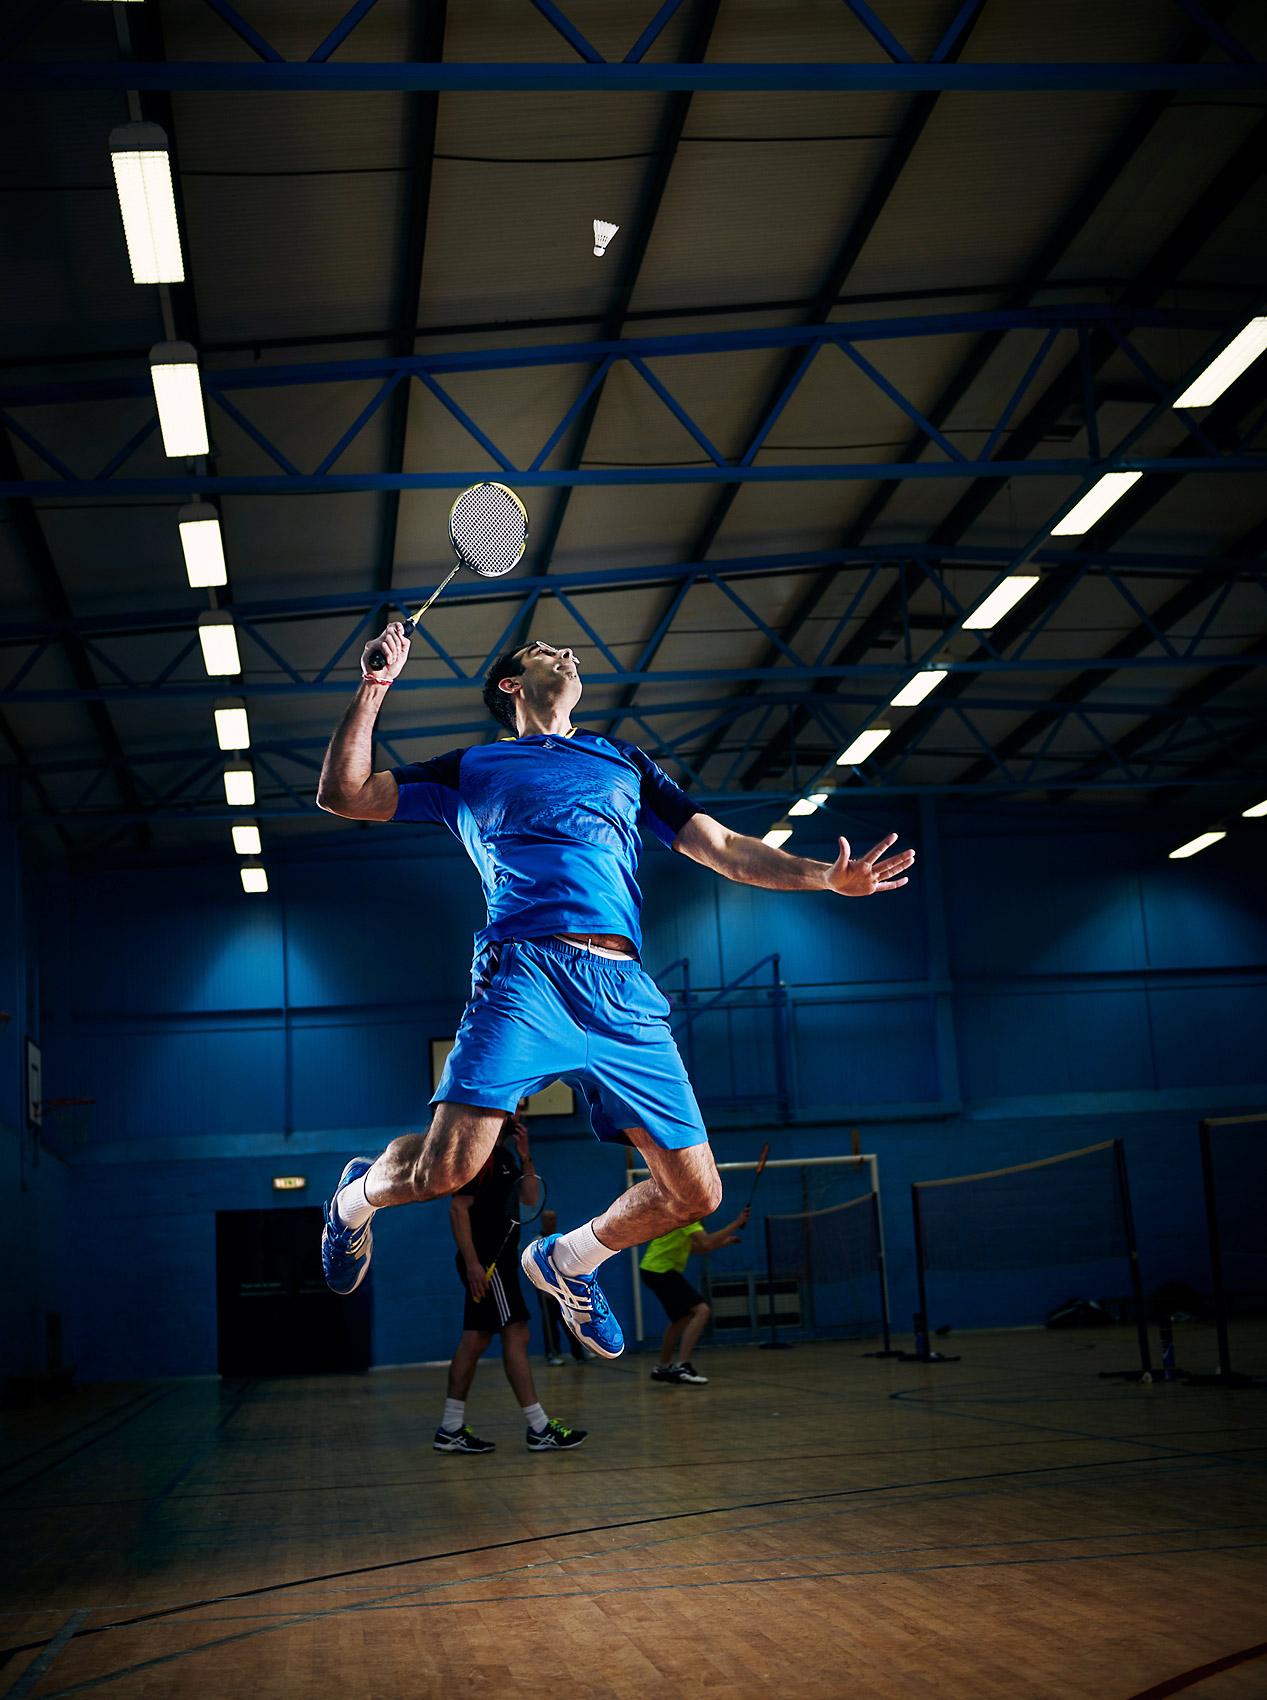 Badminton jumping smash